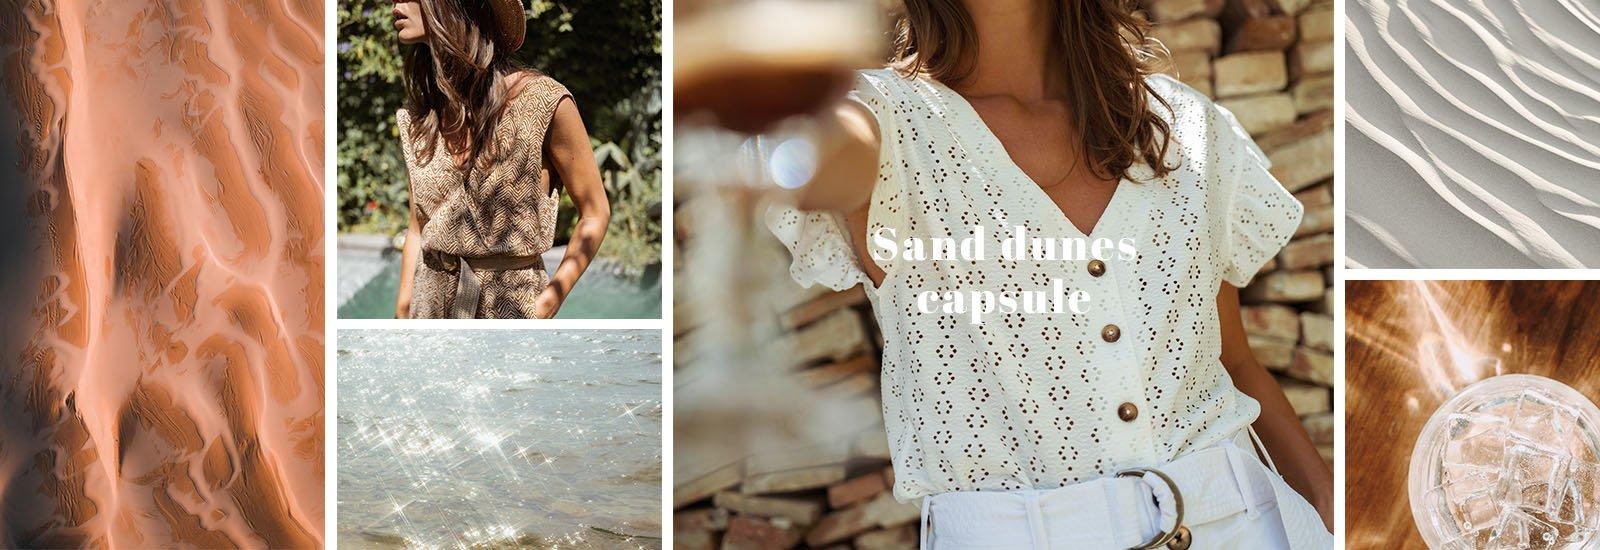 Sand dunes ☀